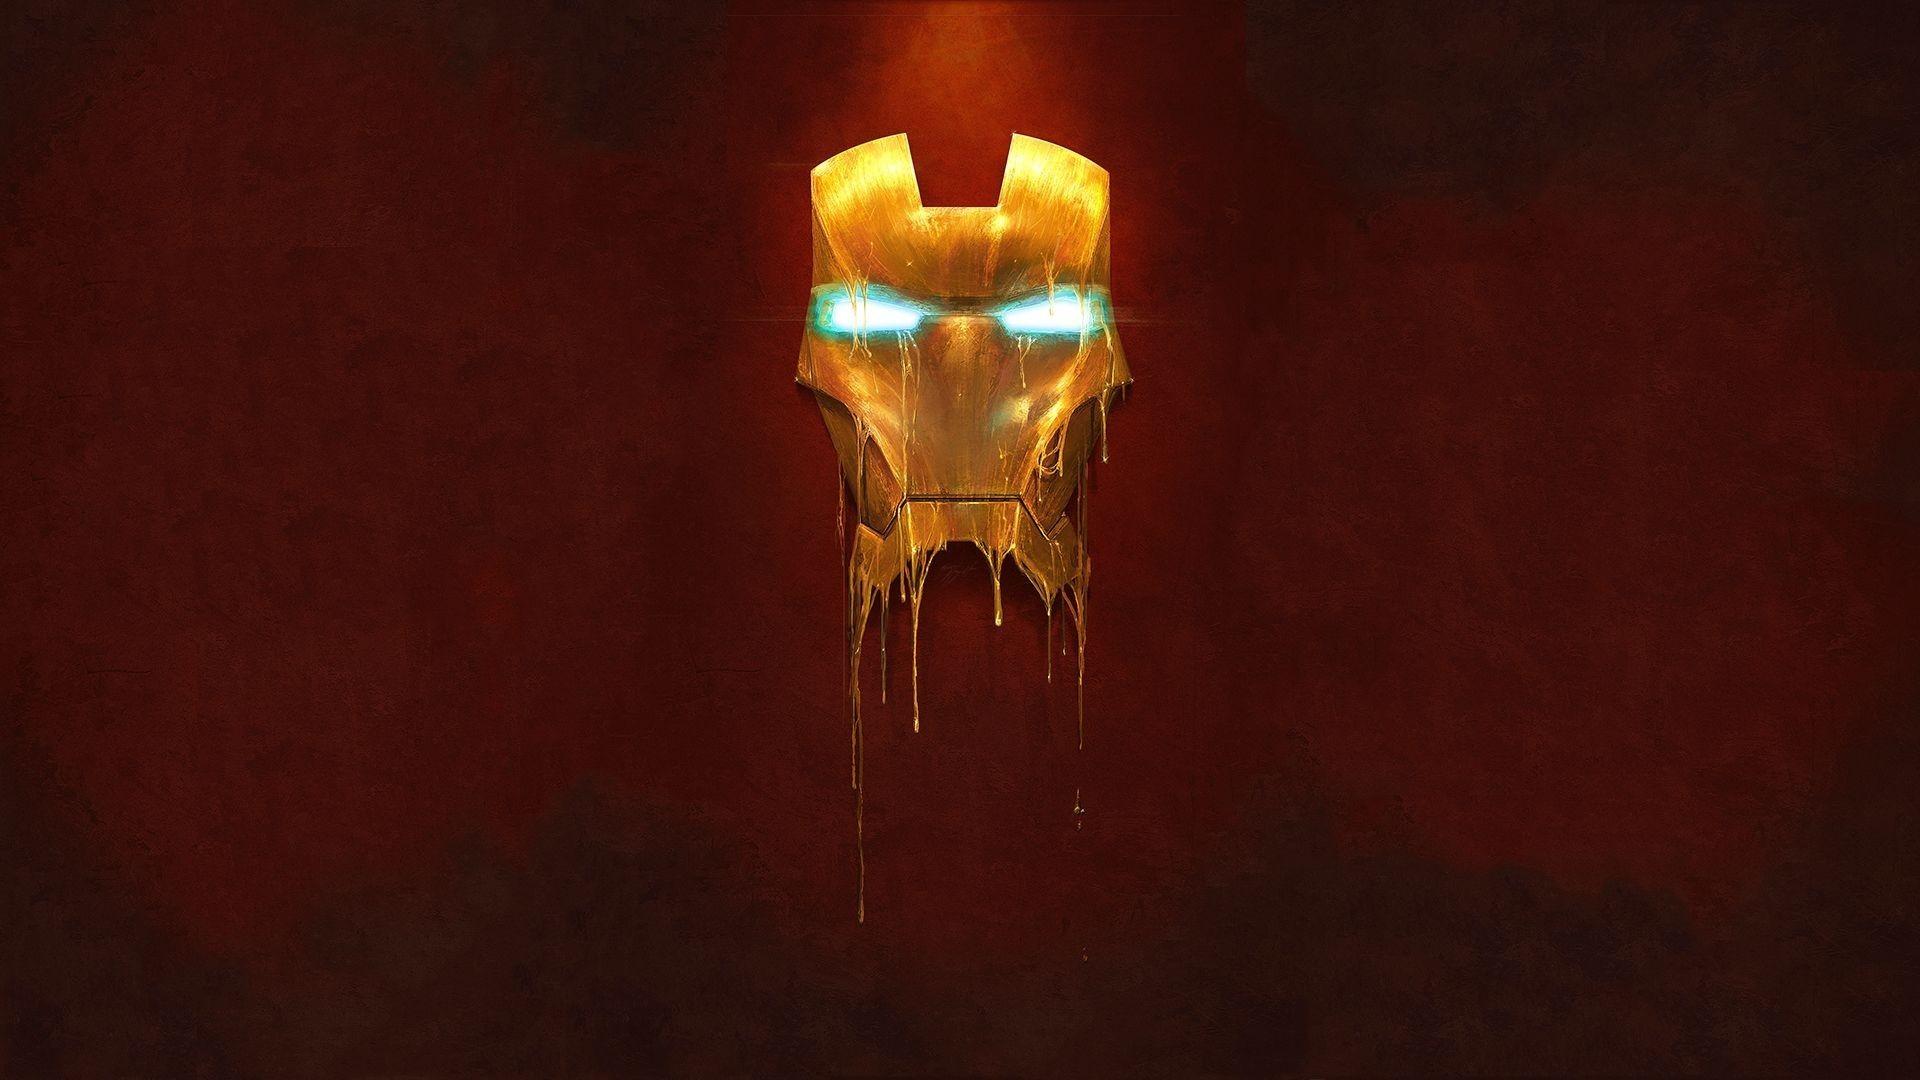 Fantastic Wallpaper Macbook Iron Man - minimalism-superhero-Iron-Man-light-lighting-darkness-1920x1080-px-light-fixture-535034  Photograph_526183.jpg